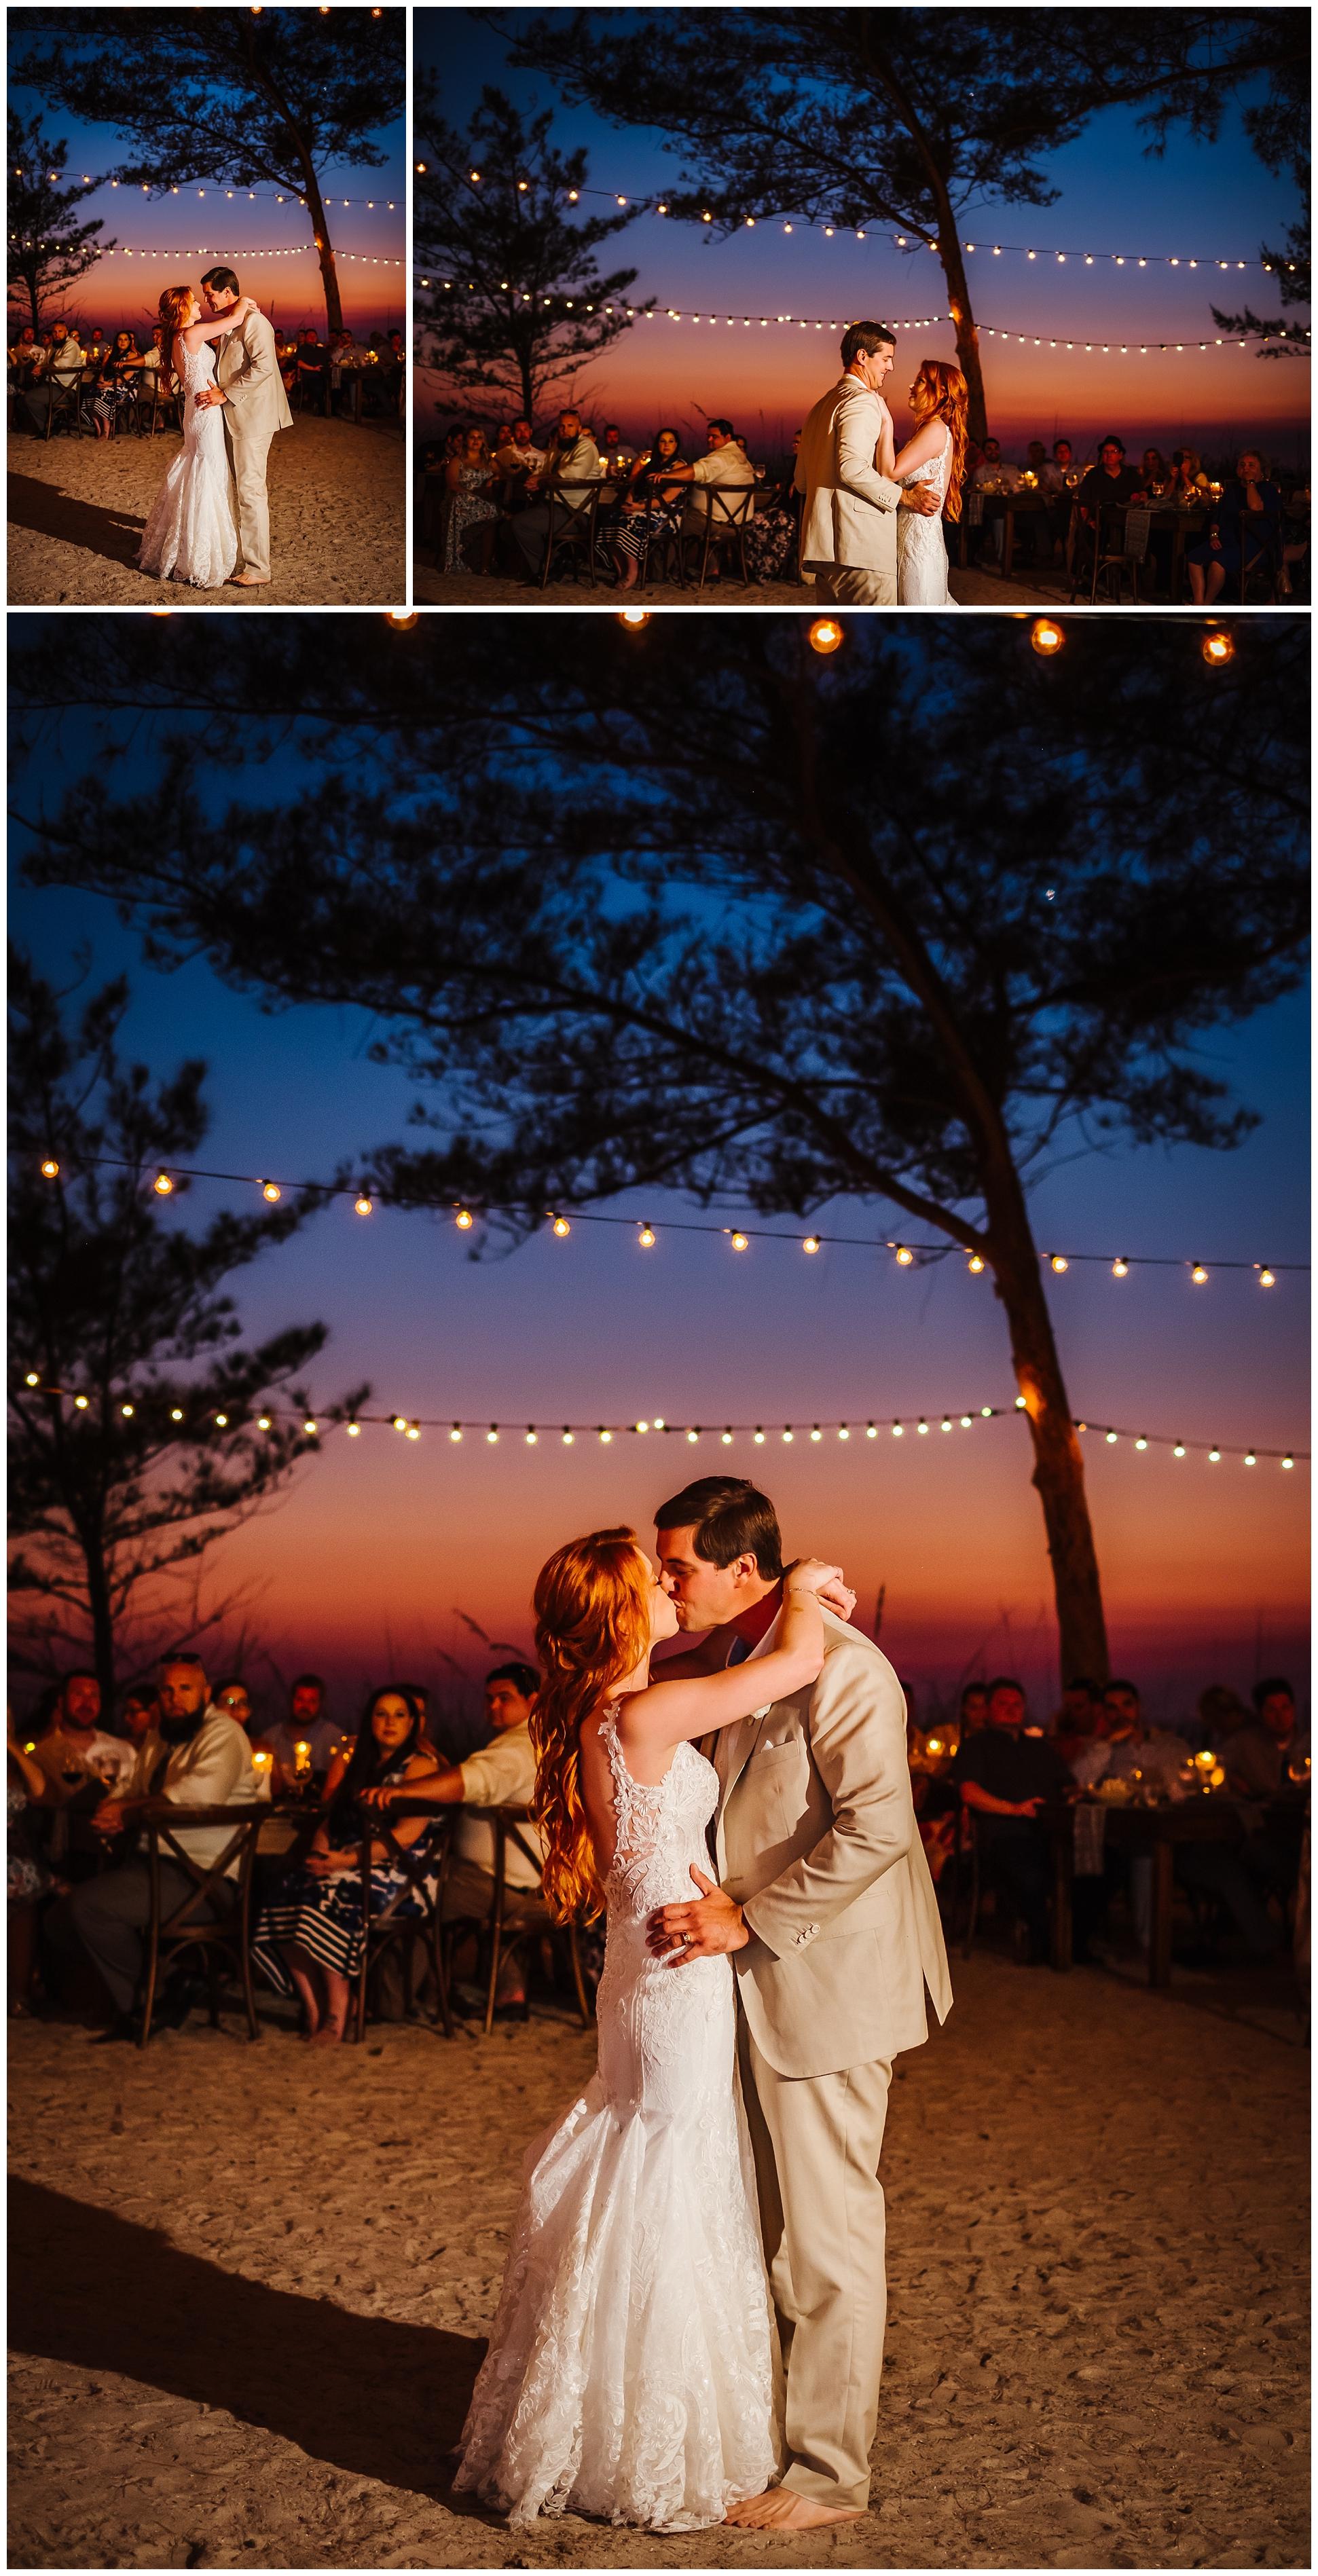 tampa-st-pete-wedding-photographer-indian-rocks-beach-mermaid-train-redhead_0172.jpg